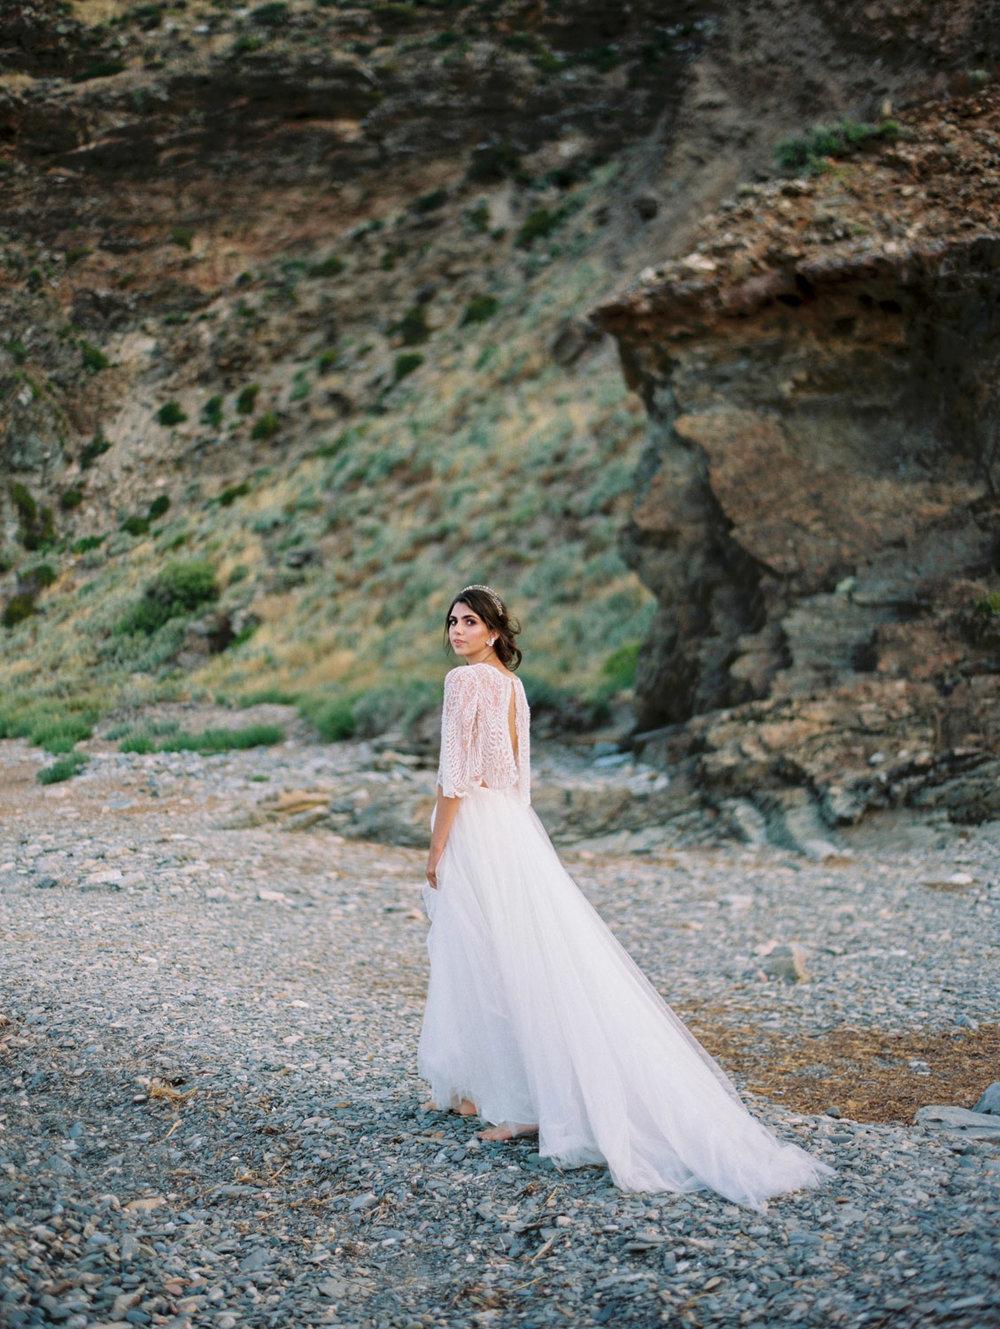 GRETA+KATE+WEDDING+DRESS+ADELAIDE.jpg